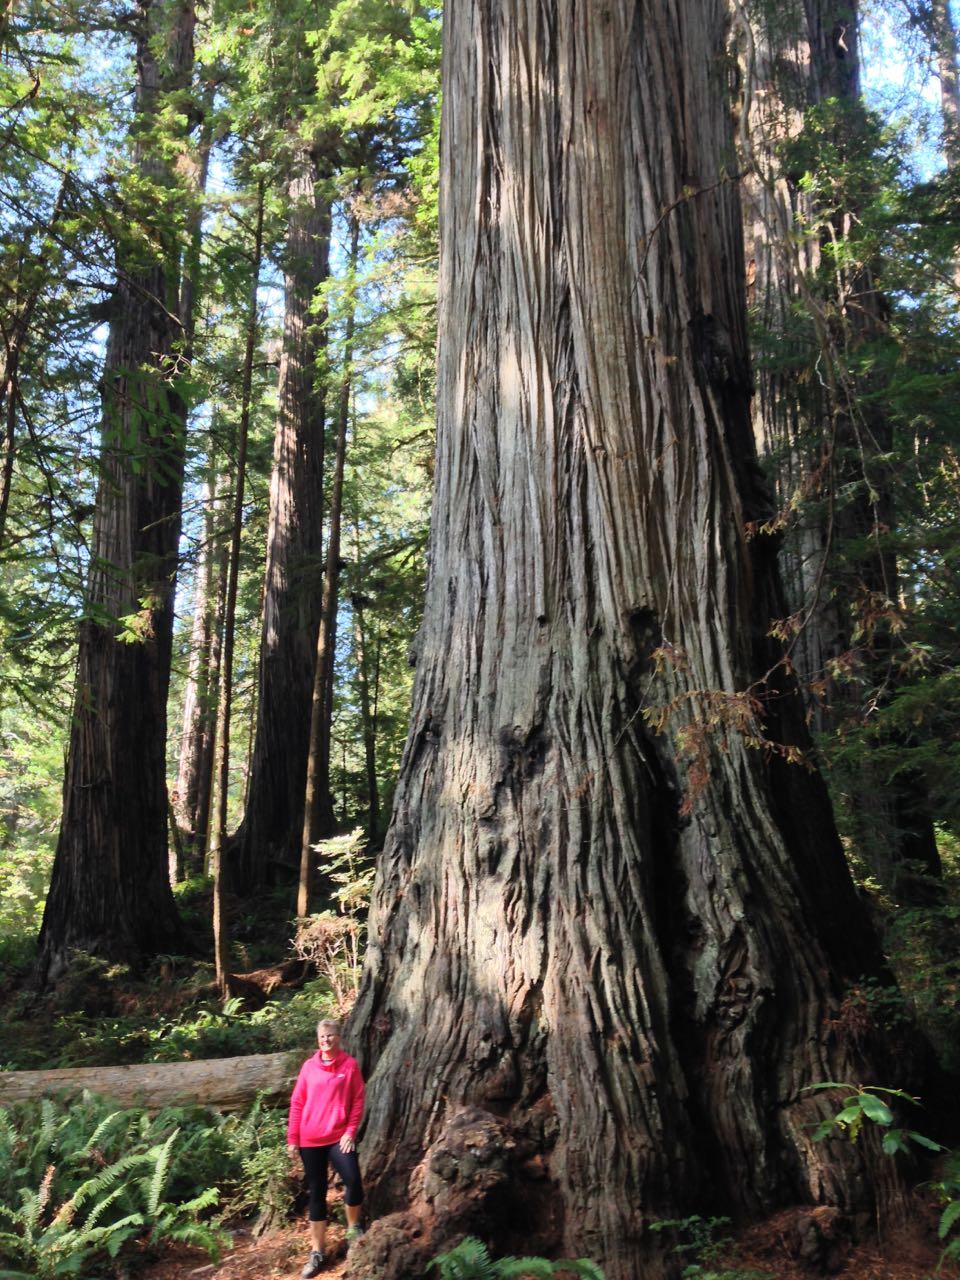 Redwoods 2017 10 08 266 Of 287